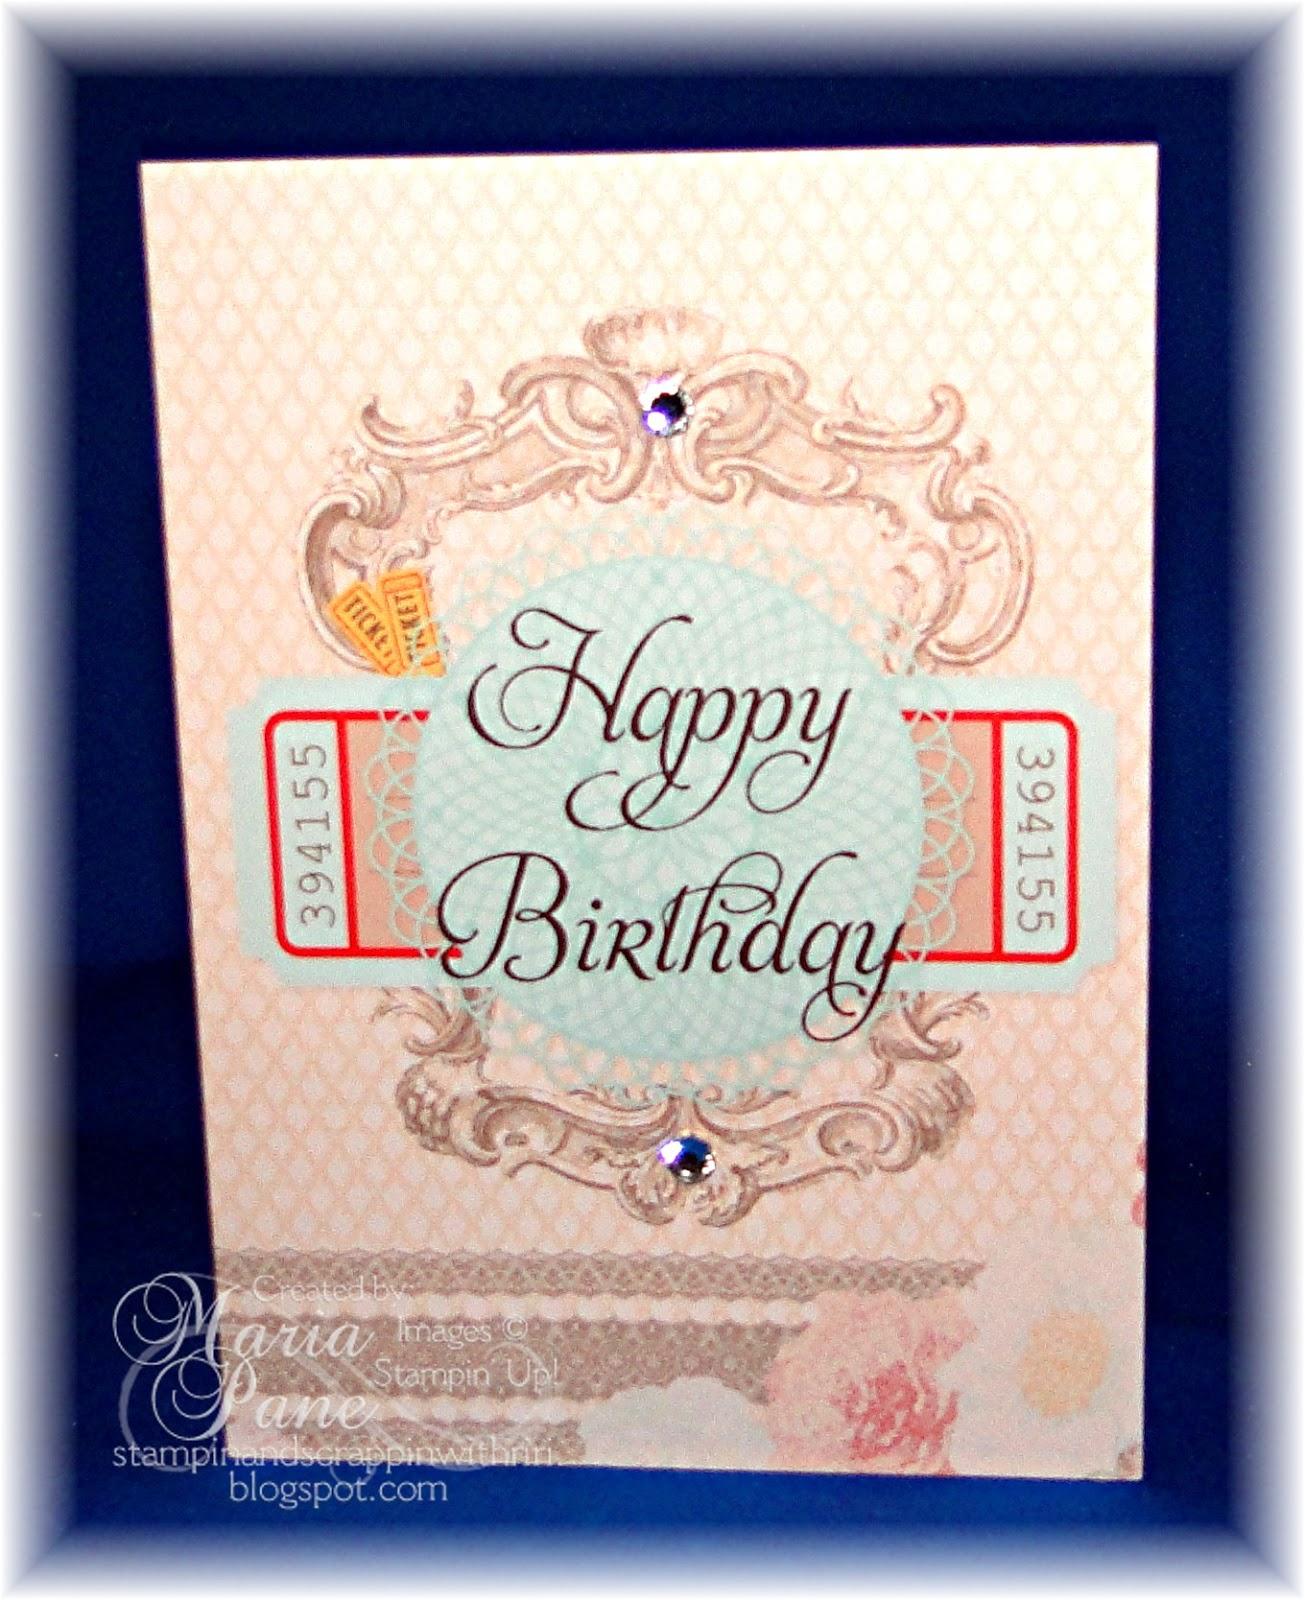 Stampin And Scrappin With Ri Ri: BIRTHDAY CARD FOR TINA